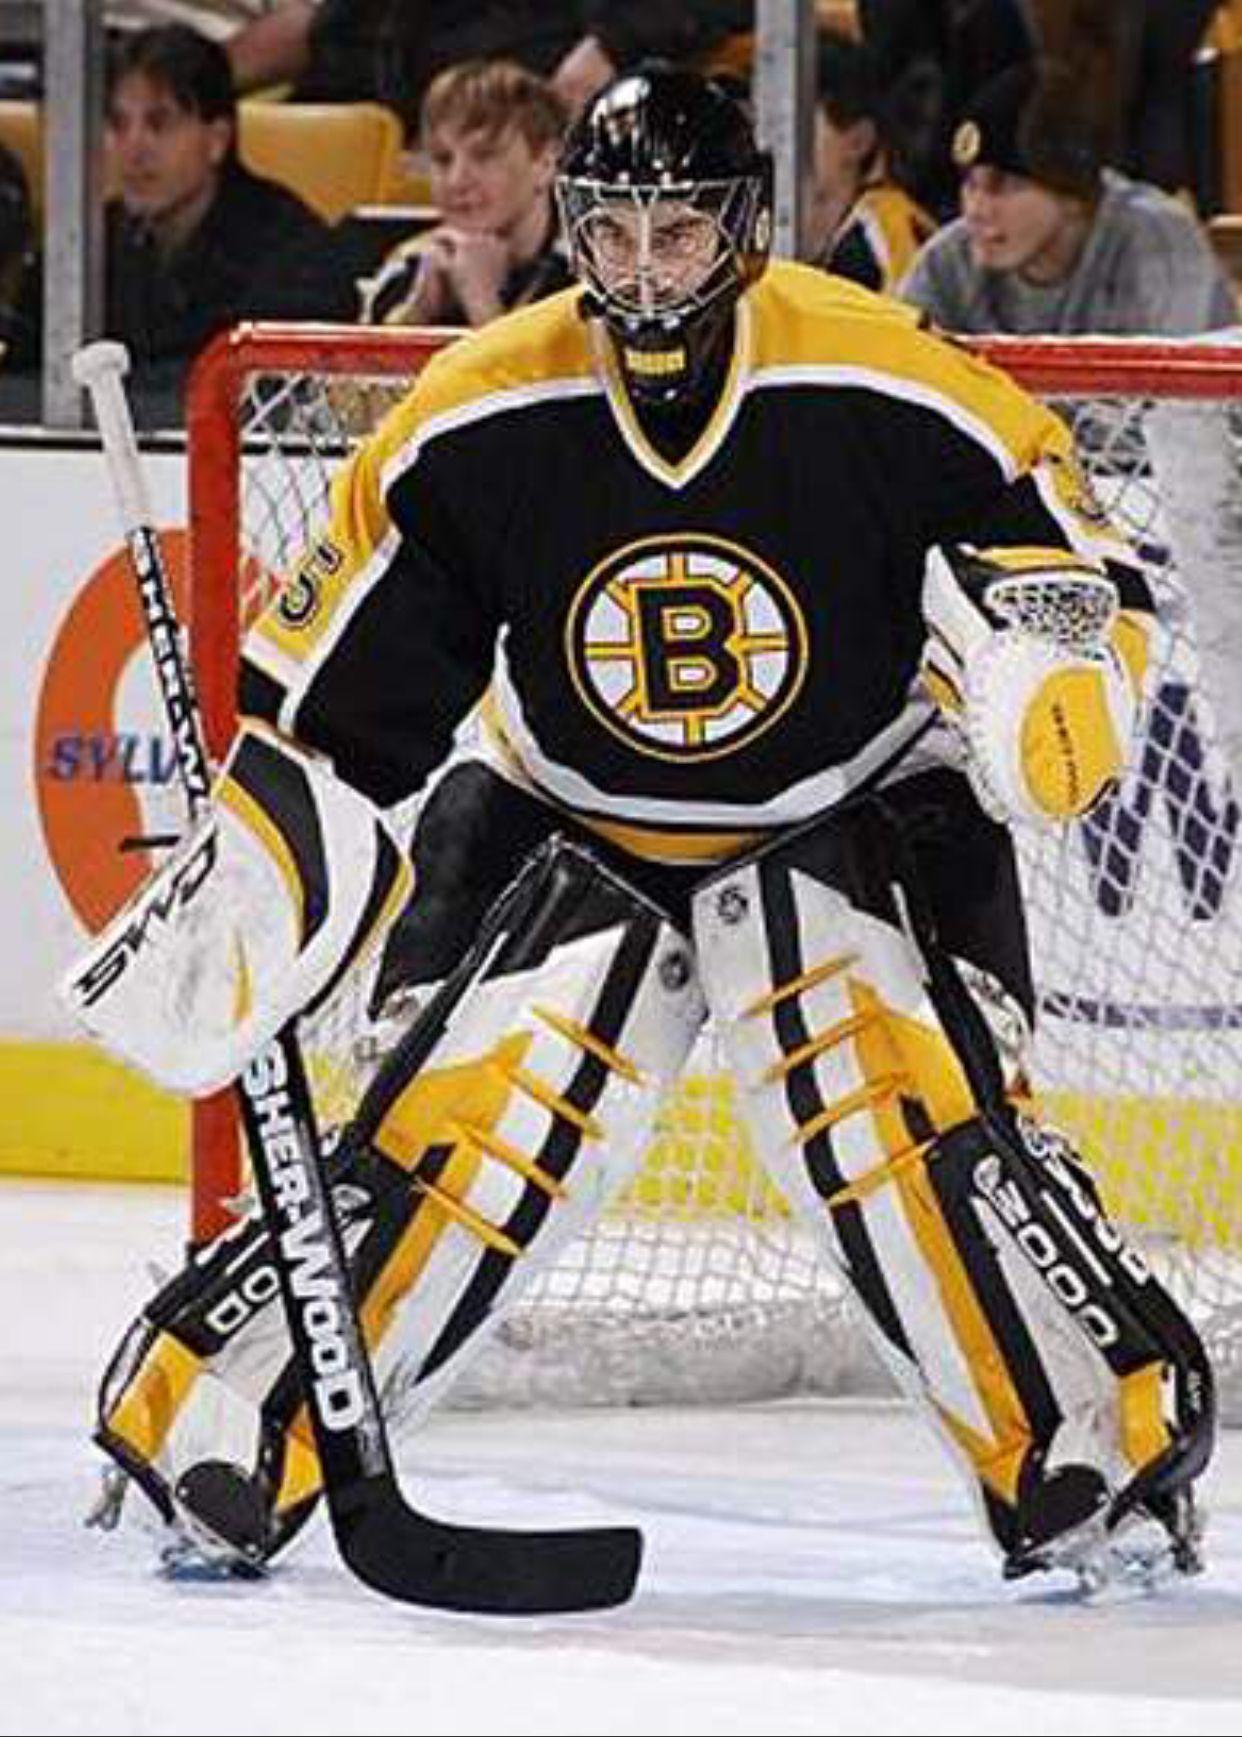 Philippe Sauve 2006 07 Bruins Goalies Boston Bruins Hockey